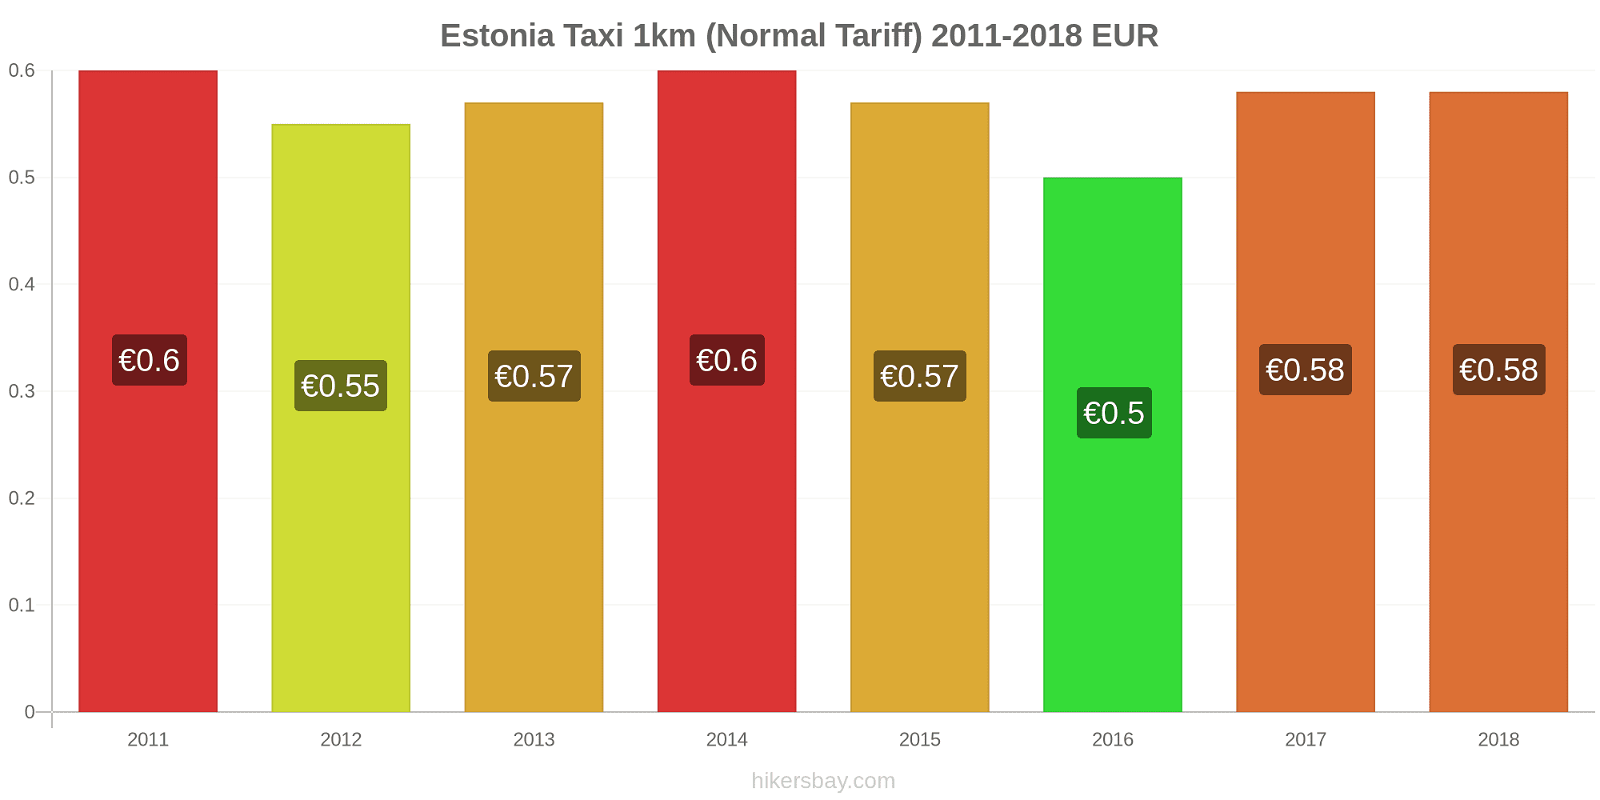 Estonia price changes Taxi 1km (Normal Tariff) hikersbay.com